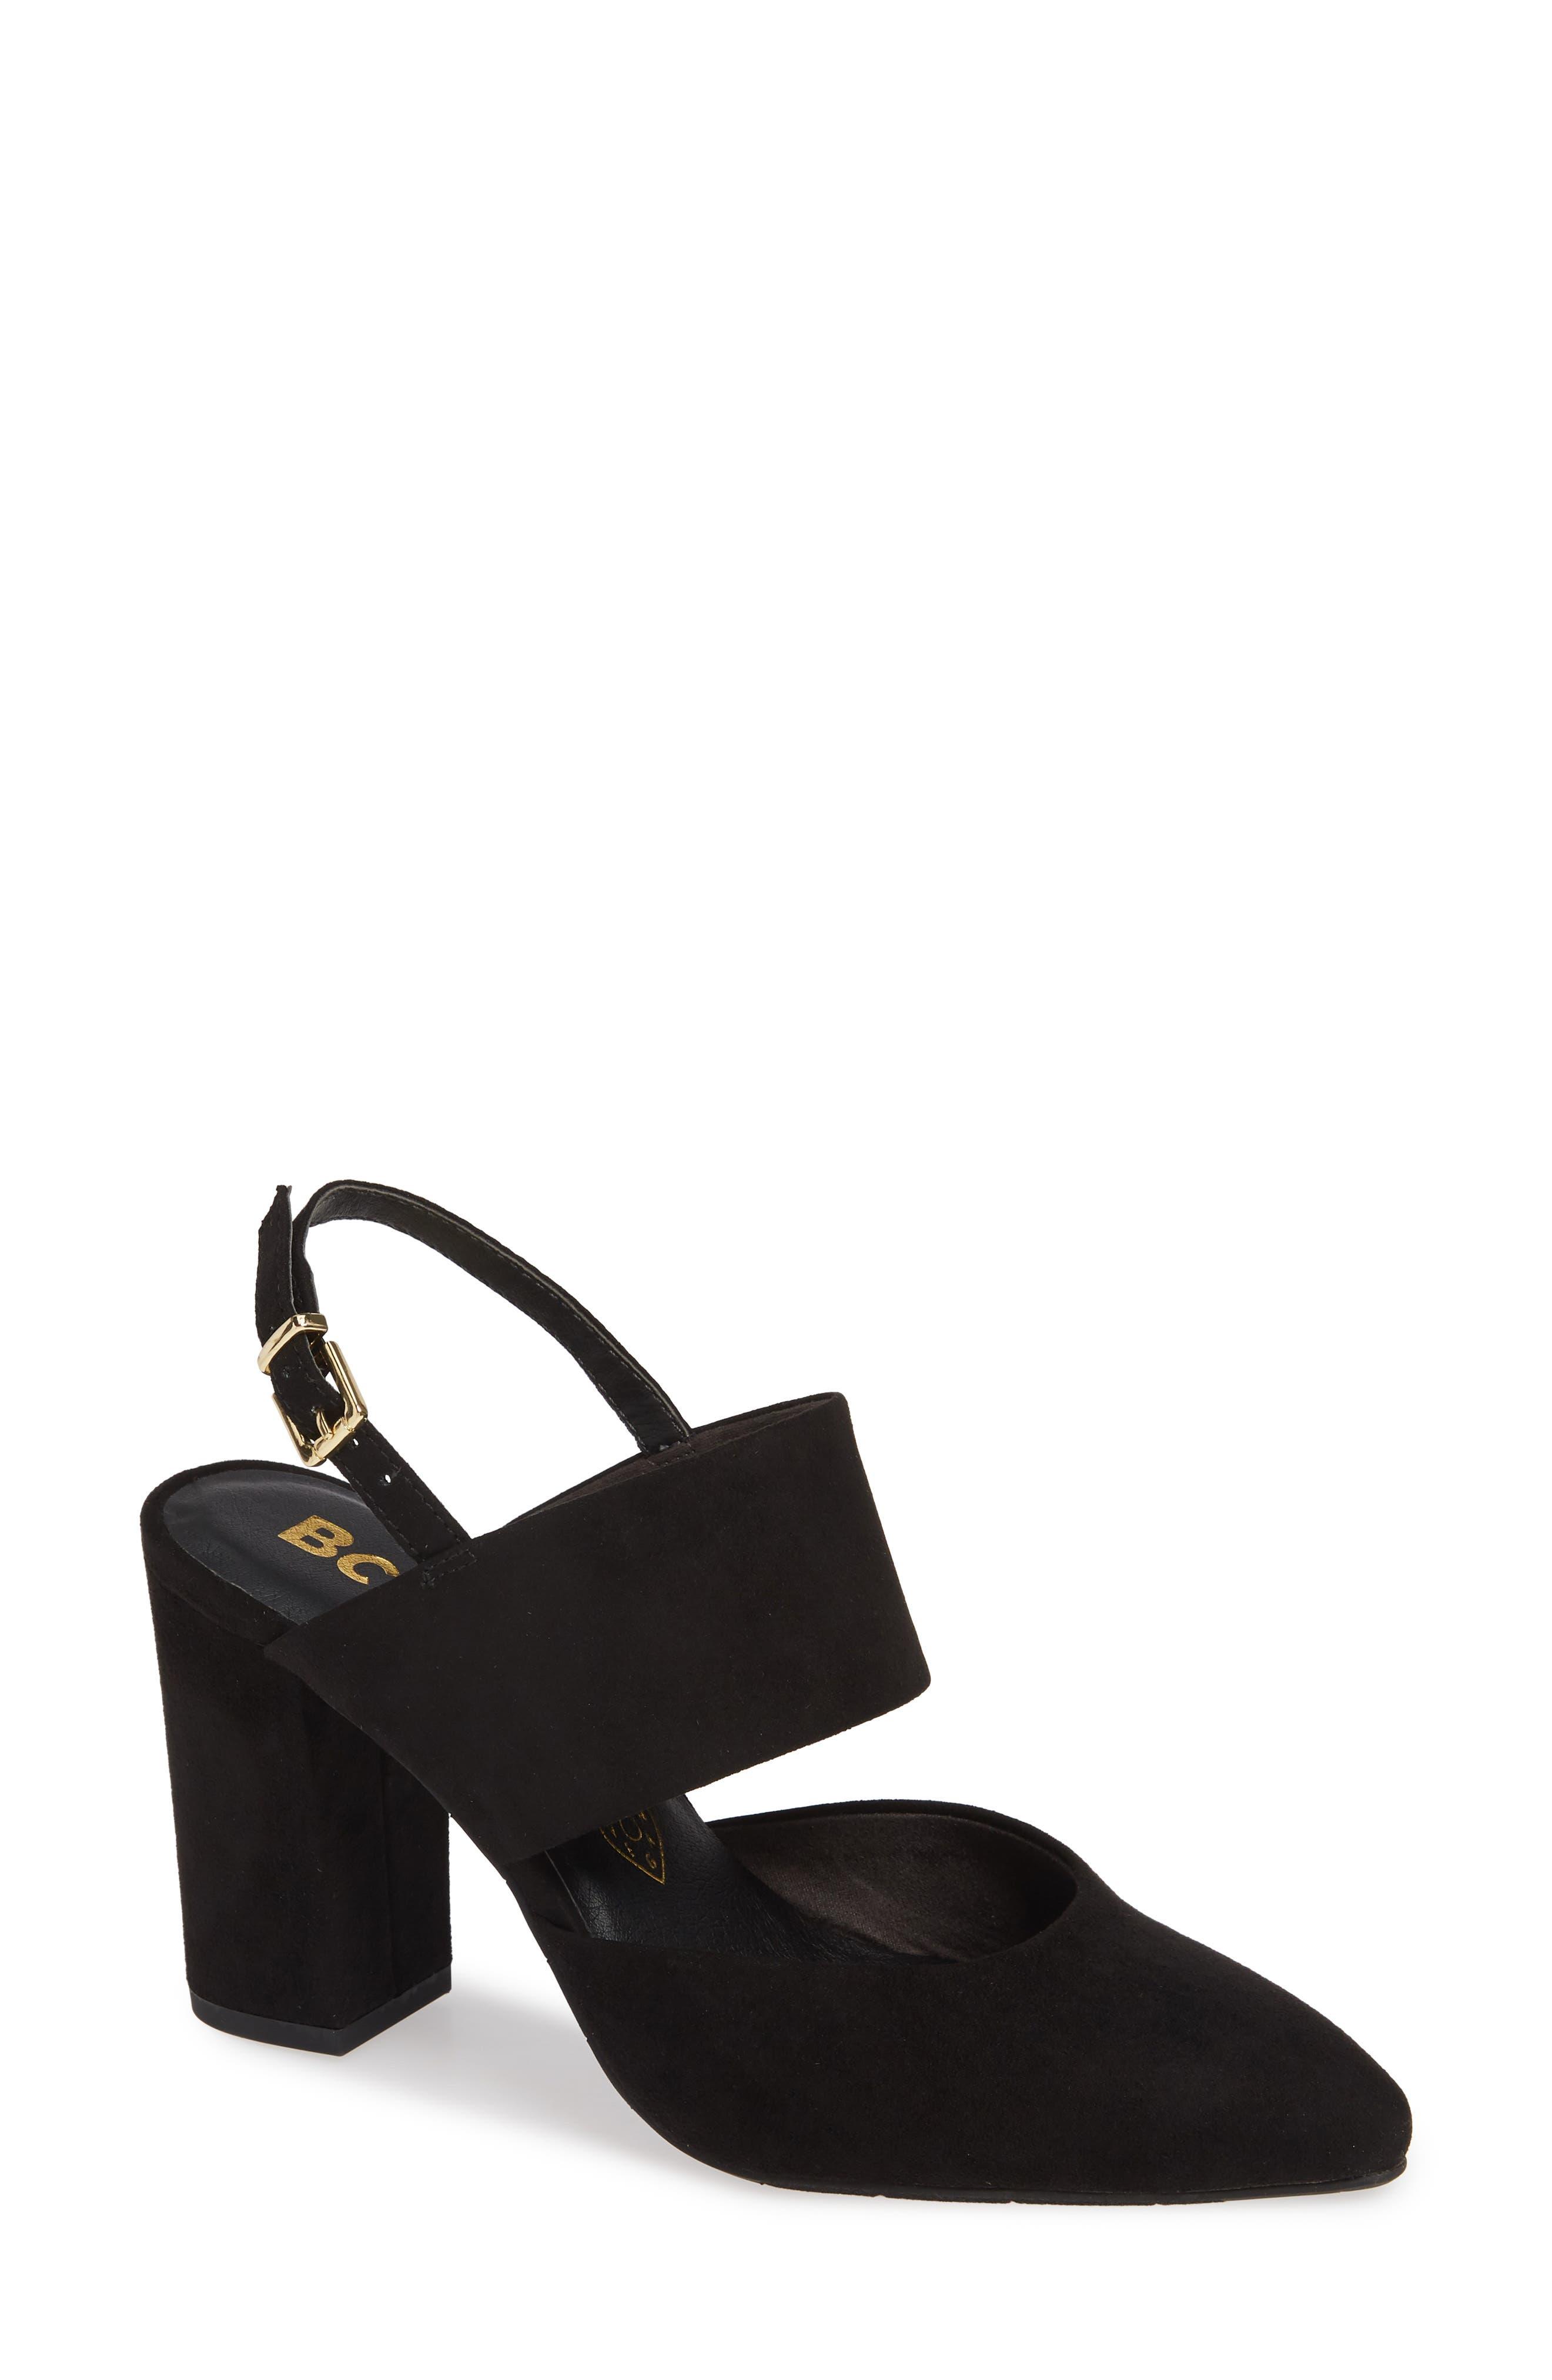 Bc Footwear Value Vegan Slingback Pump- Black